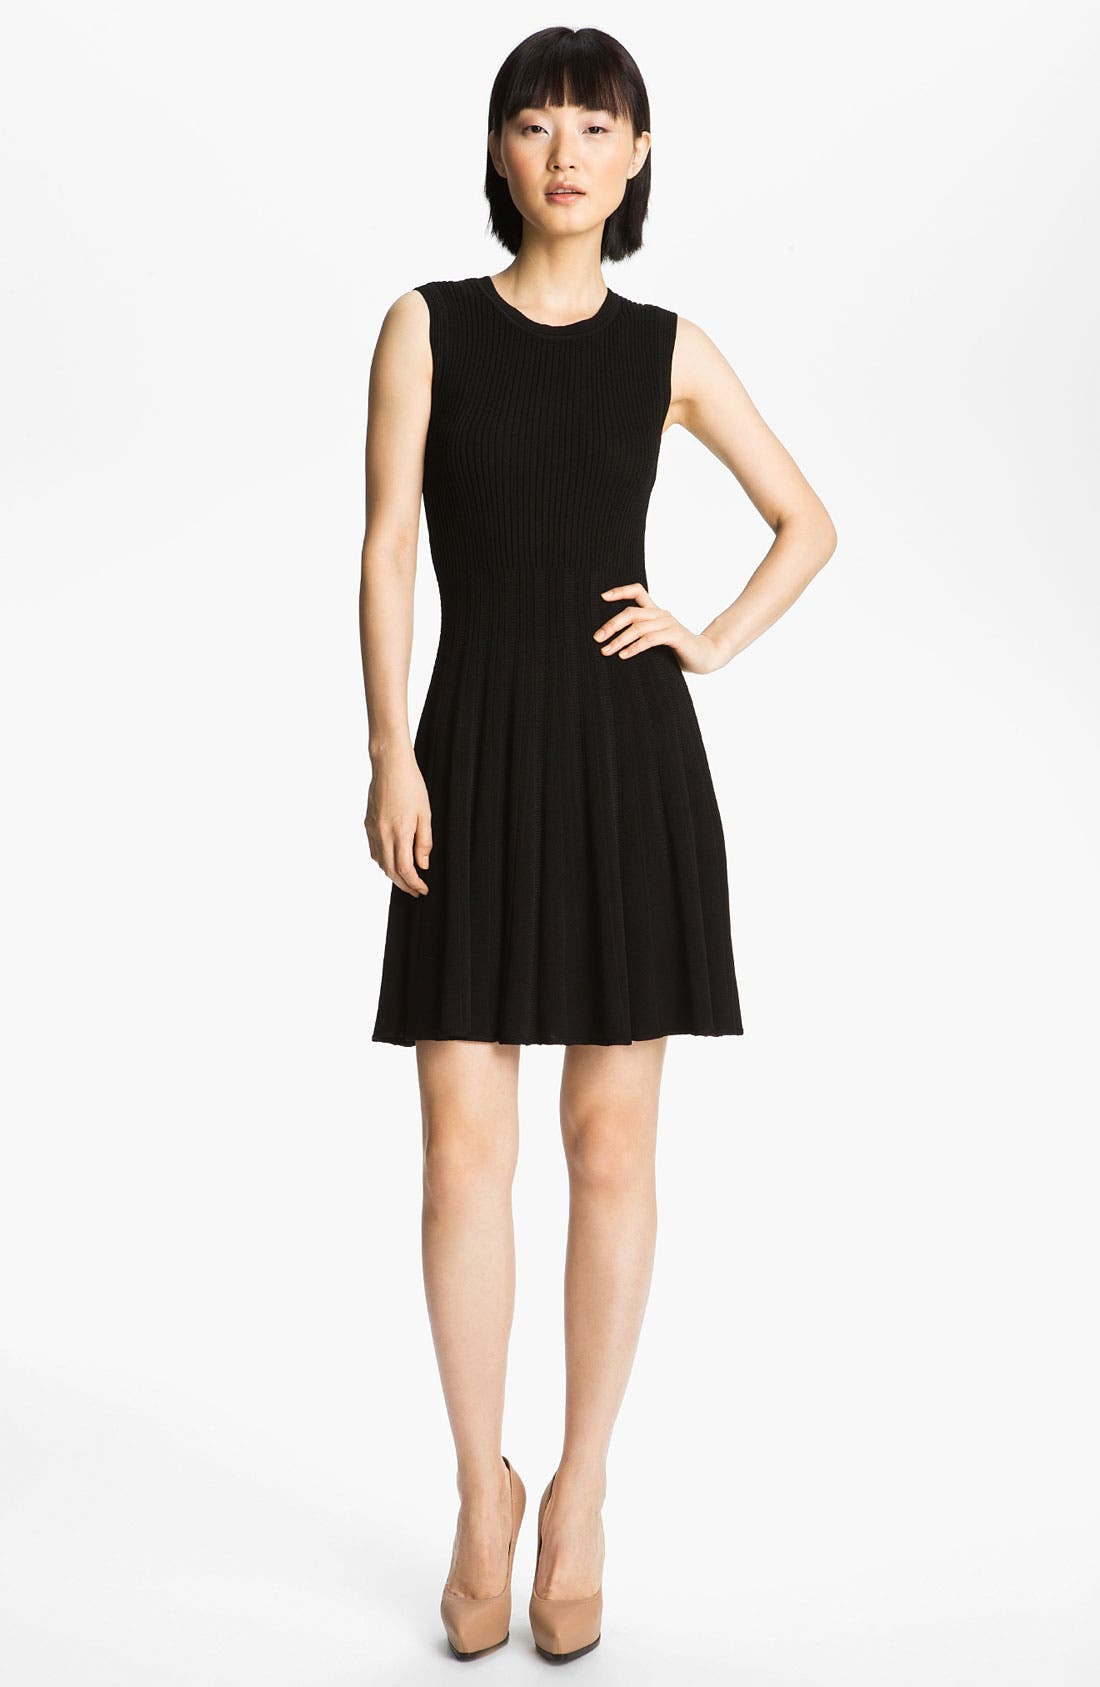 Alternate Image 1 Selected - Mcginn 'Erin' Knit Dress